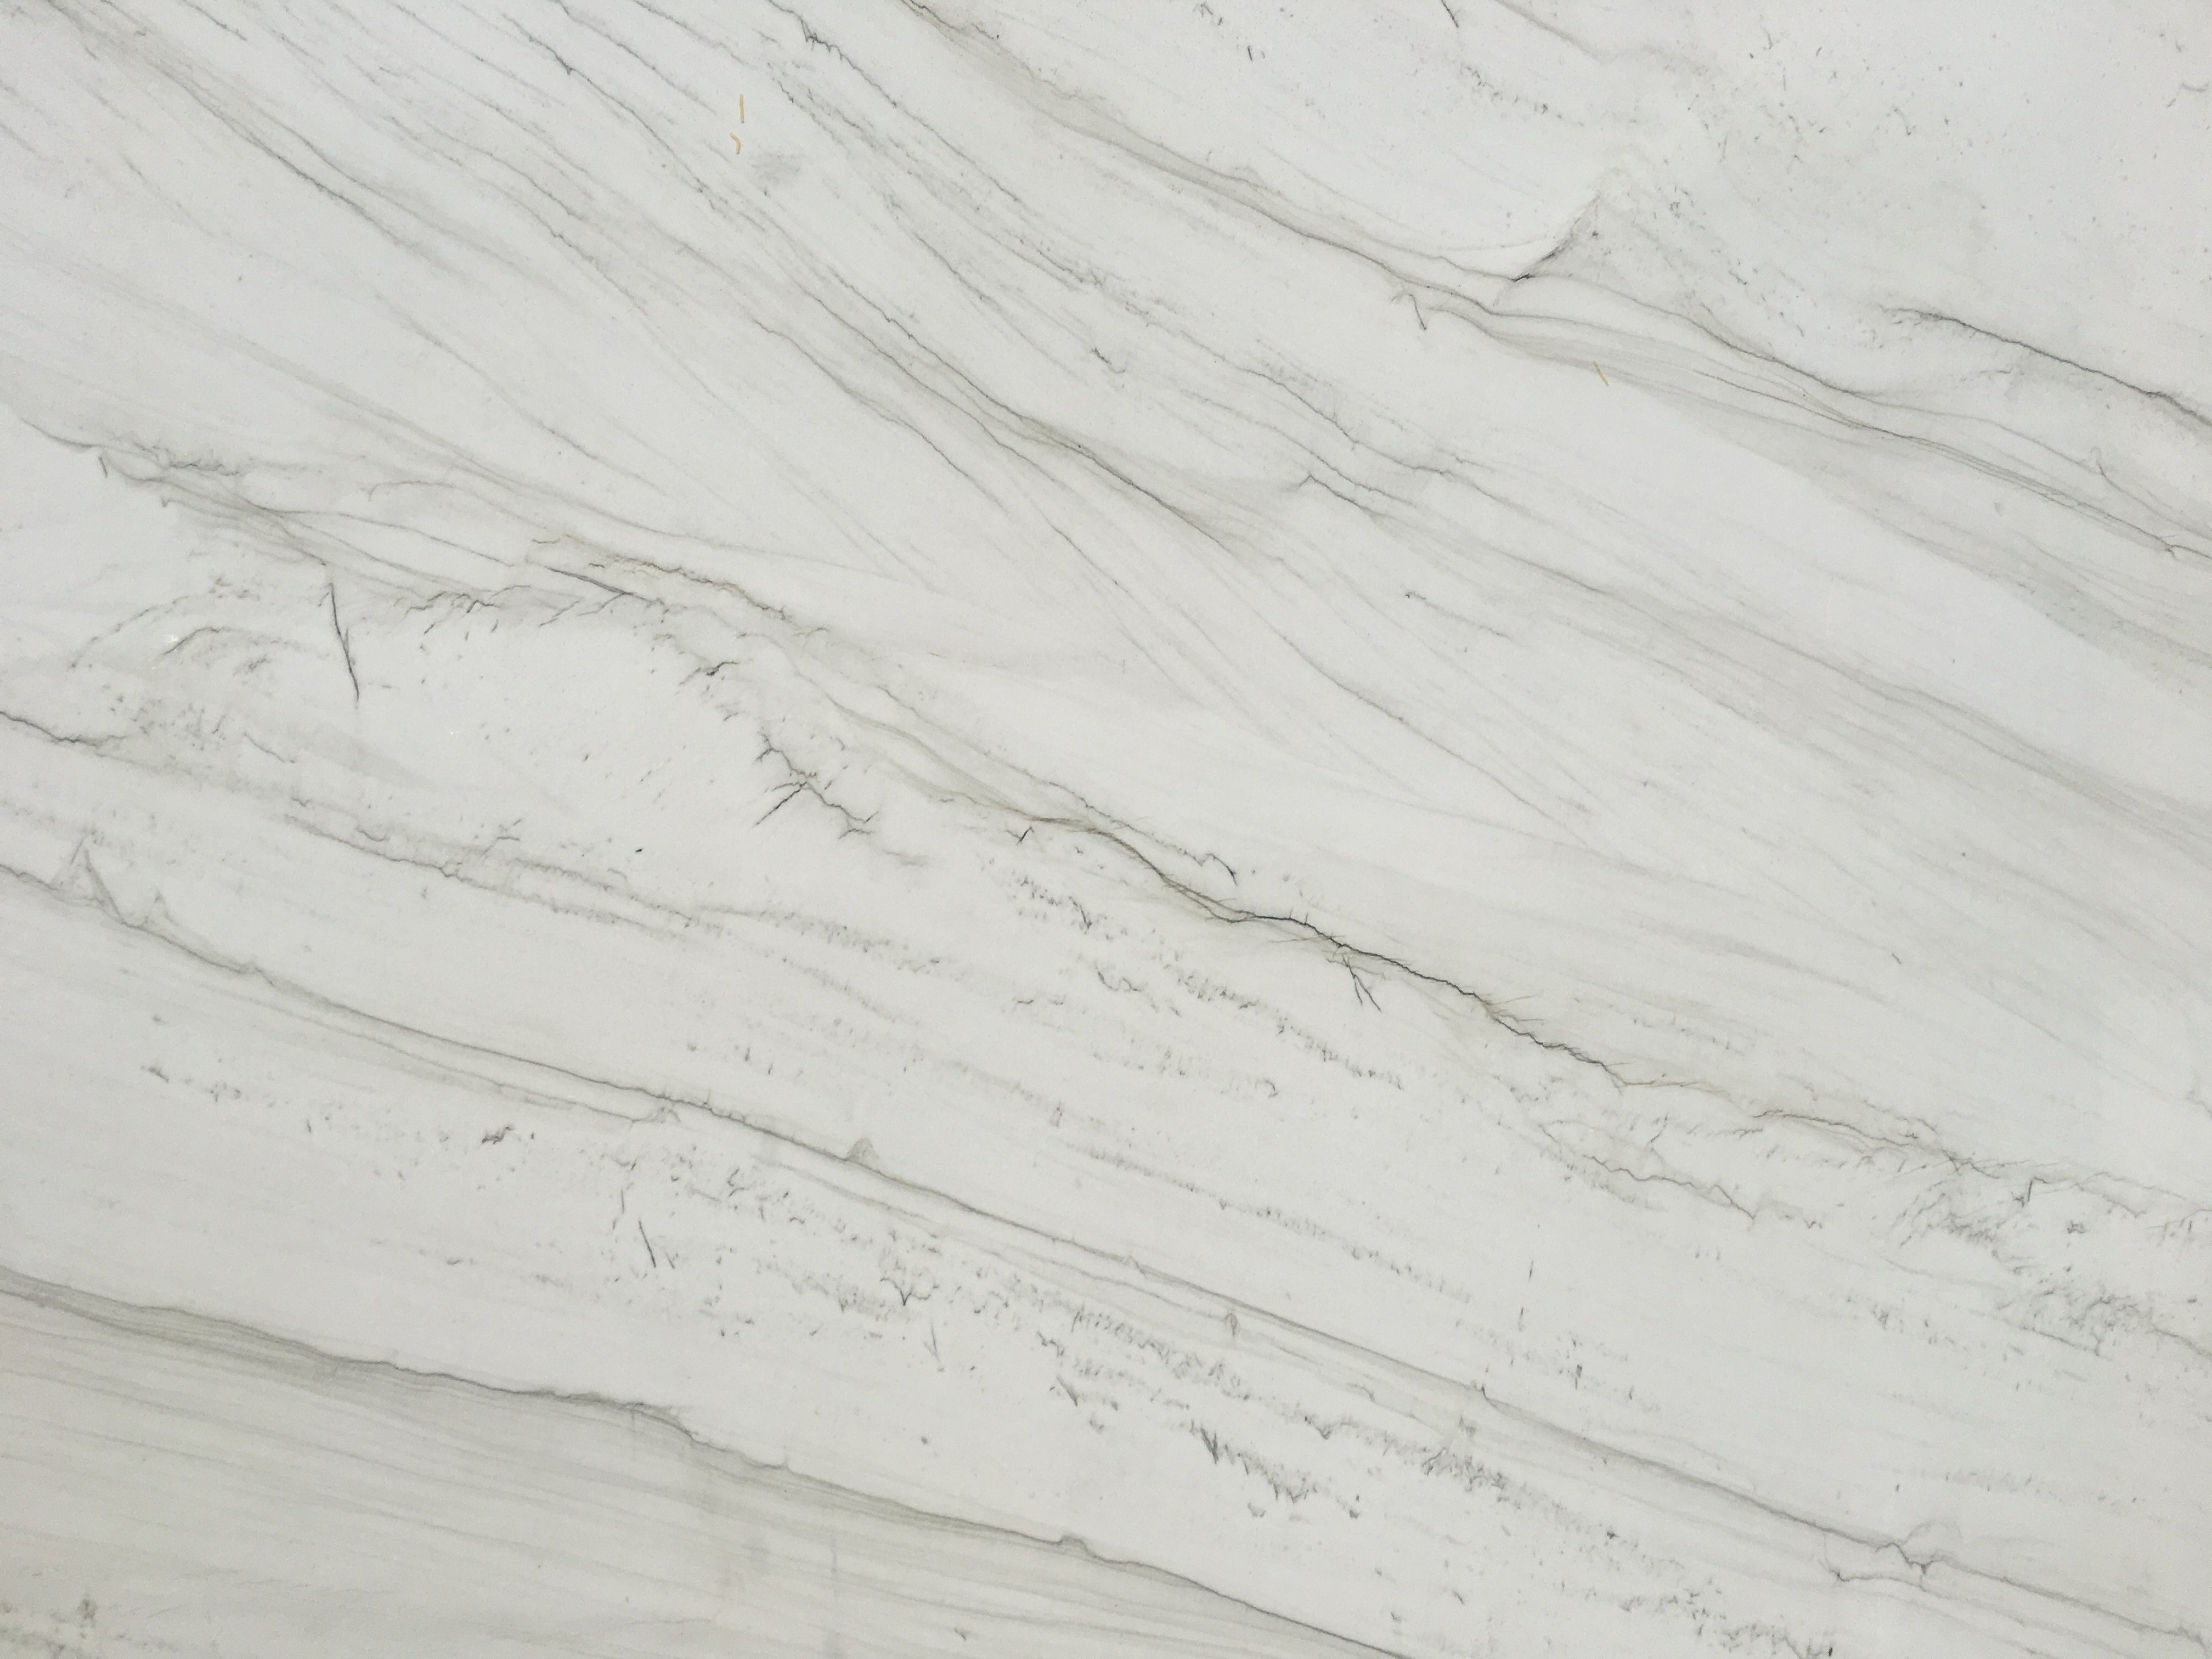 Mont Blanc Polished Quartzite Slab Trendy Surfaces